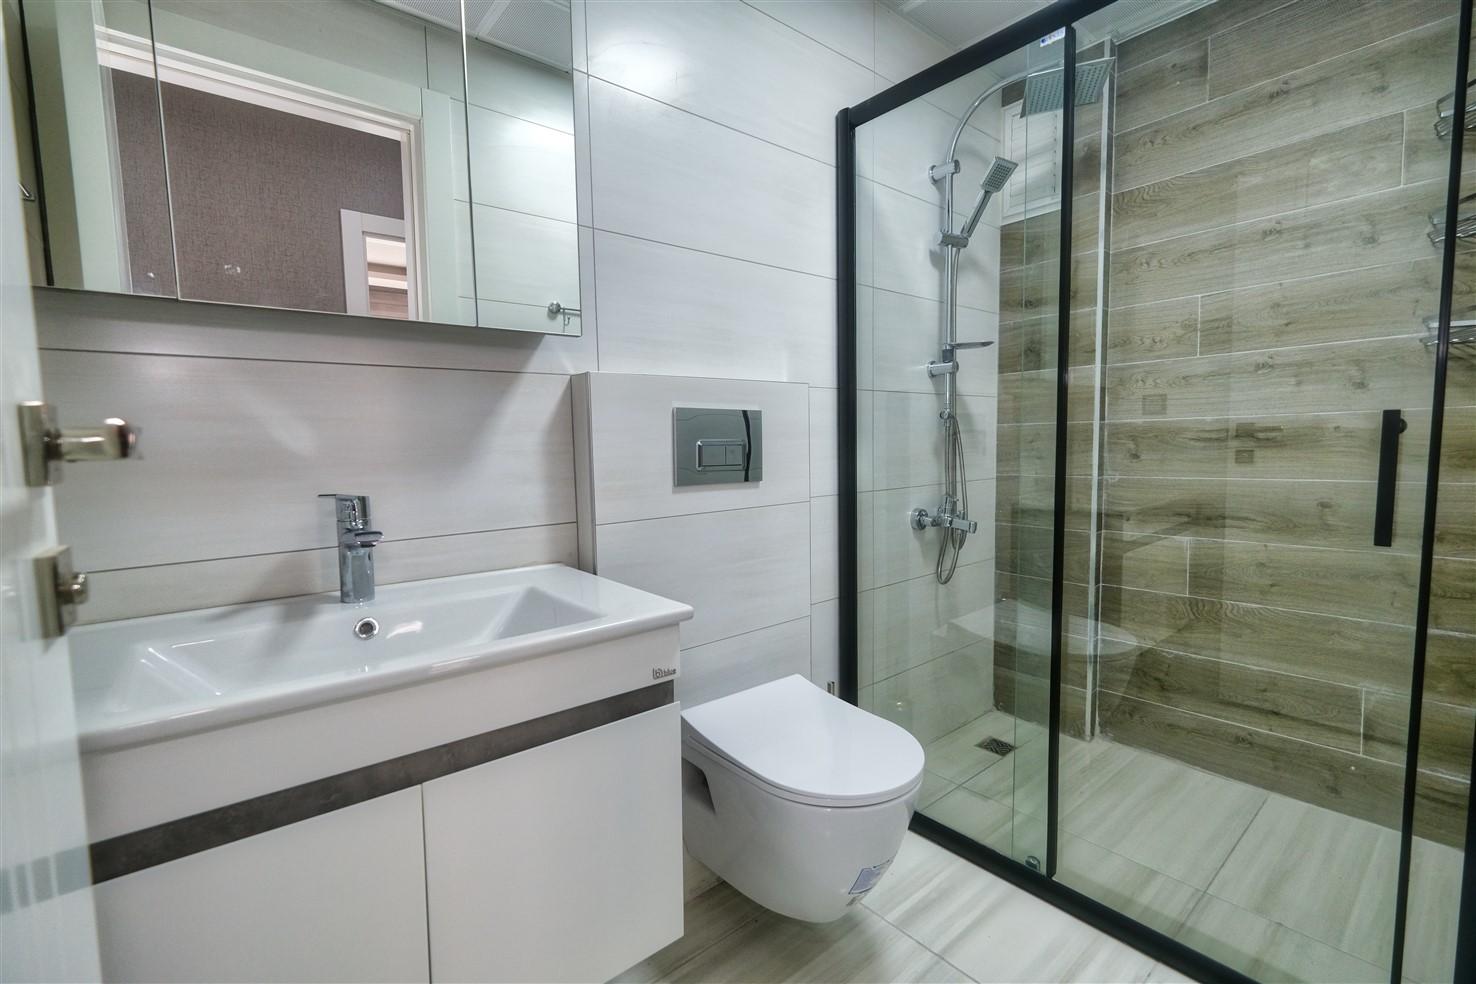 Трёхкомнатная квартира в центре Антальи - Фото 35